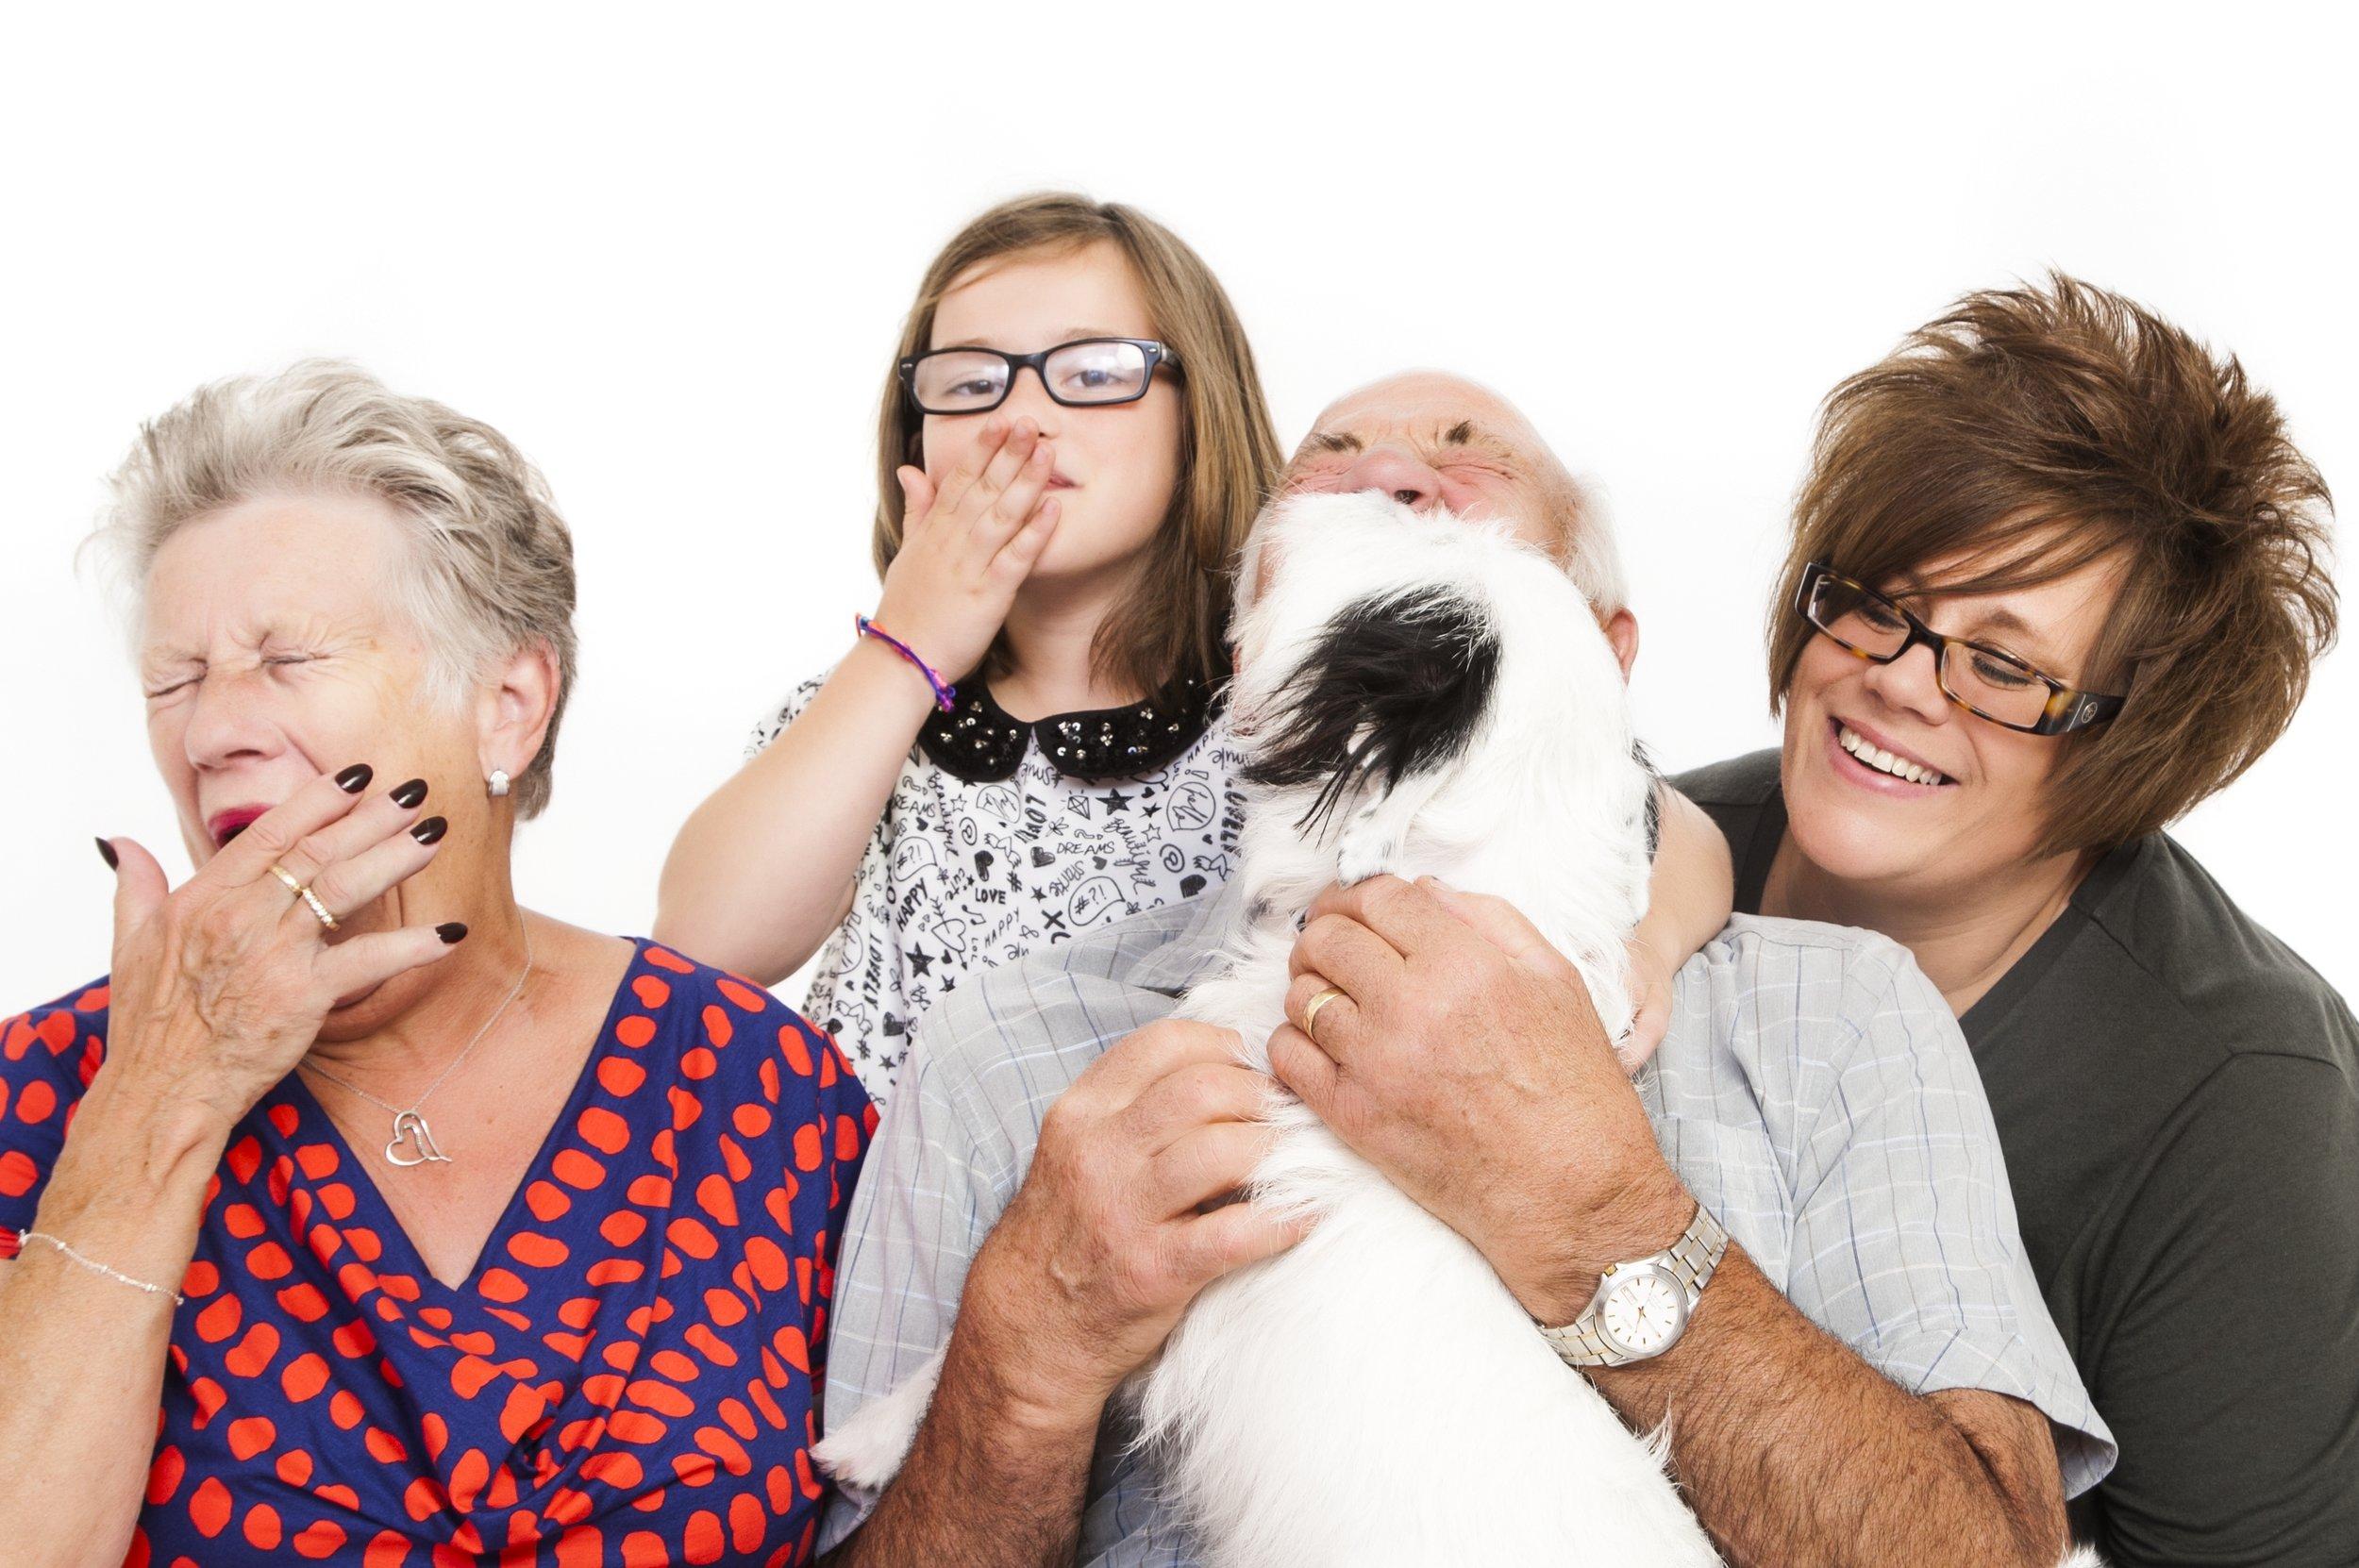 zigzag-photography-leicester-zig-zag-photographers-photo-studio-clarendon-park-queens-road-best-family-portraits-children-dog-animal-pet-lick.jpg